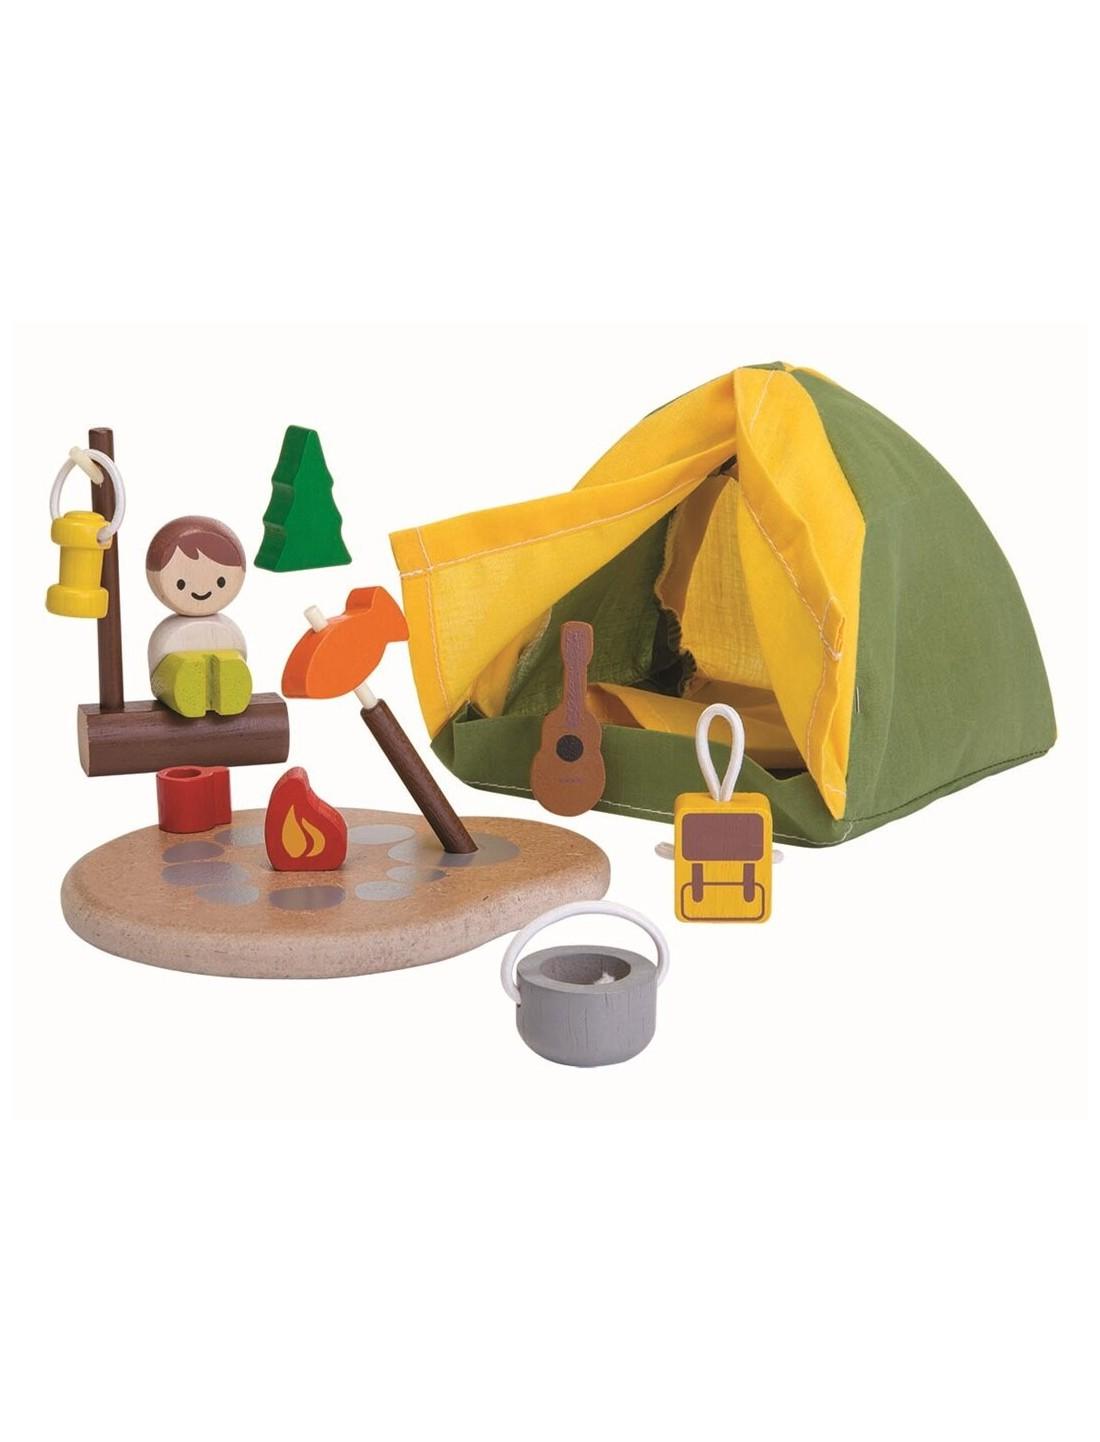 Camping set. PlanToys